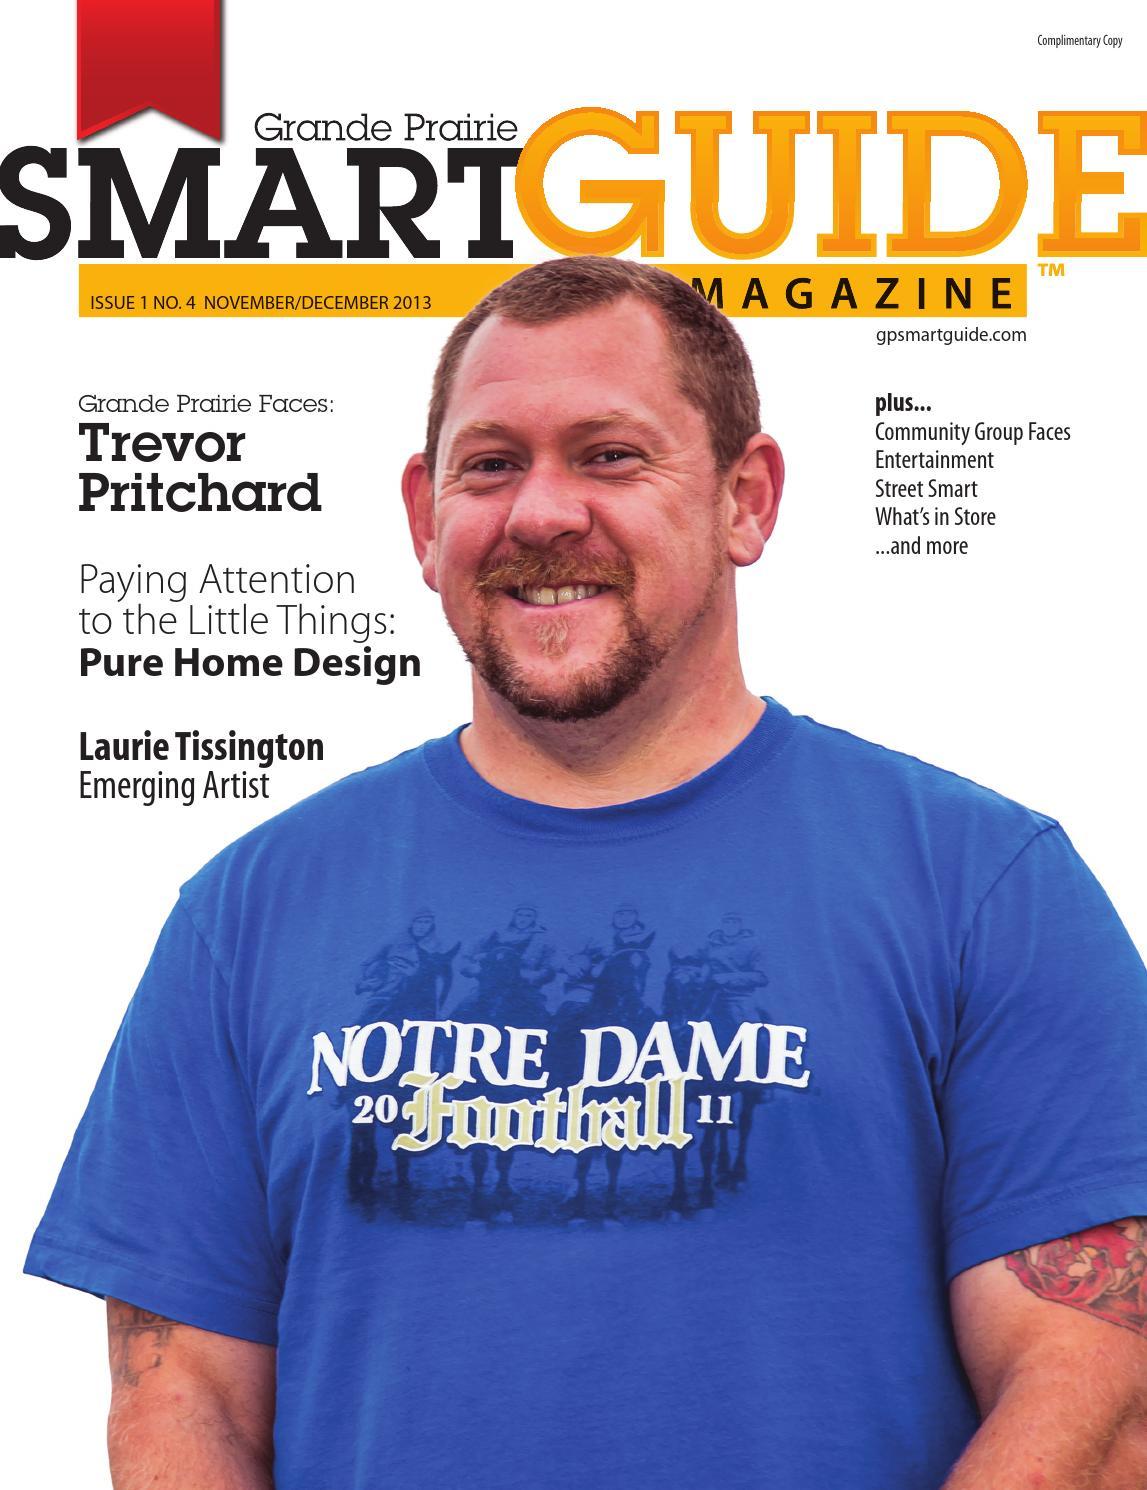 Grande Prairie Smart Guide Magazine Nov/Dec 2013 by Smart